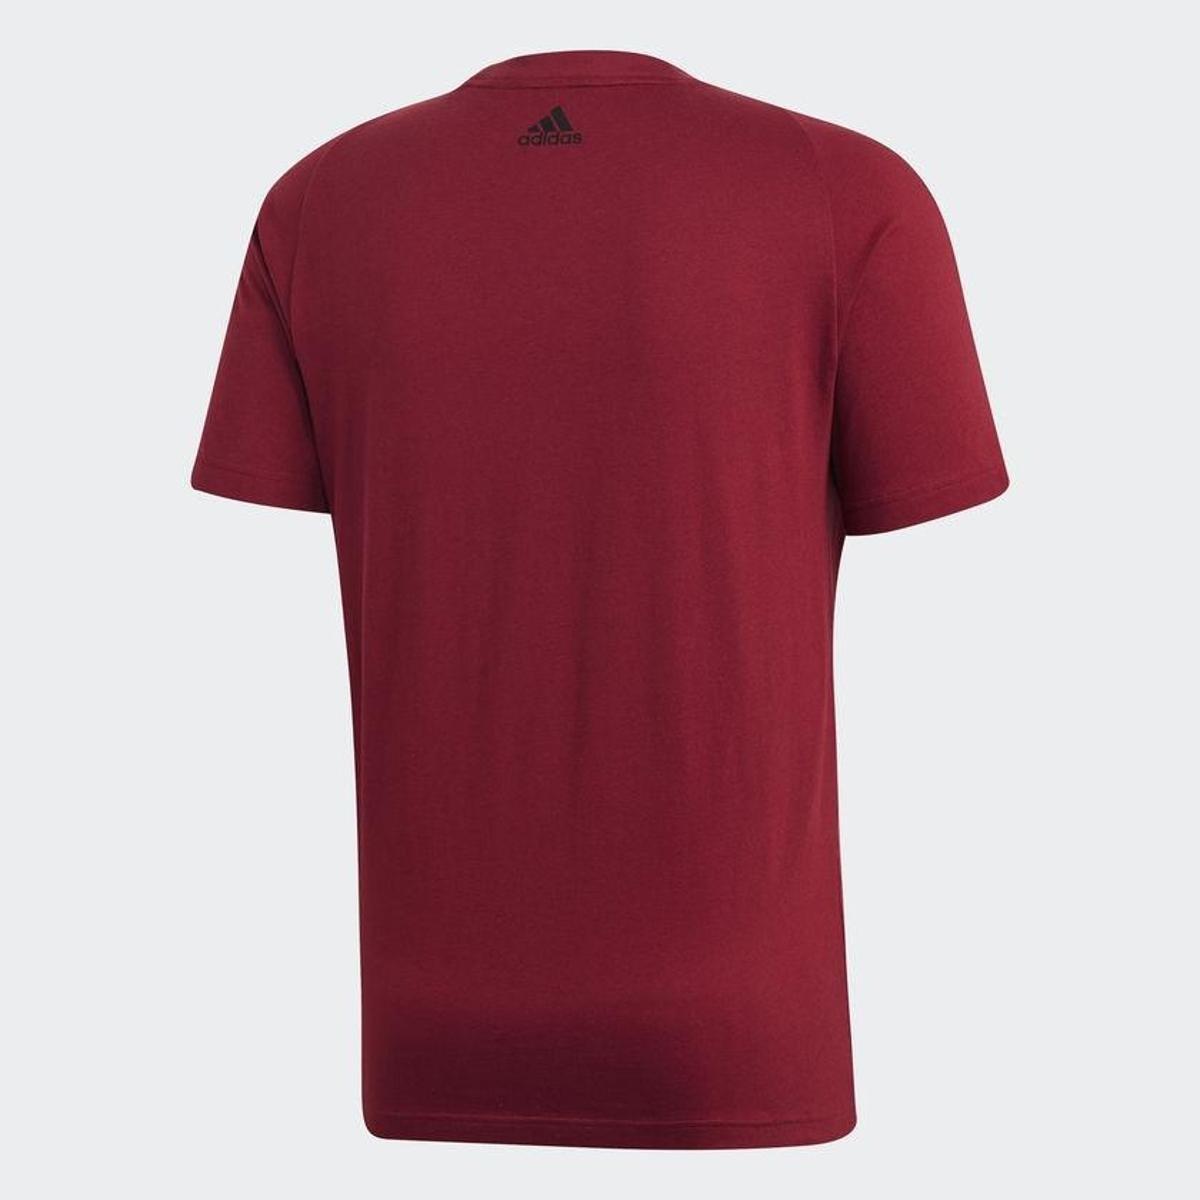 f77f9dd63b Camiseta Adidas Manga Curta Masculina  Camiseta Adidas Manga Curta Masculina  ...